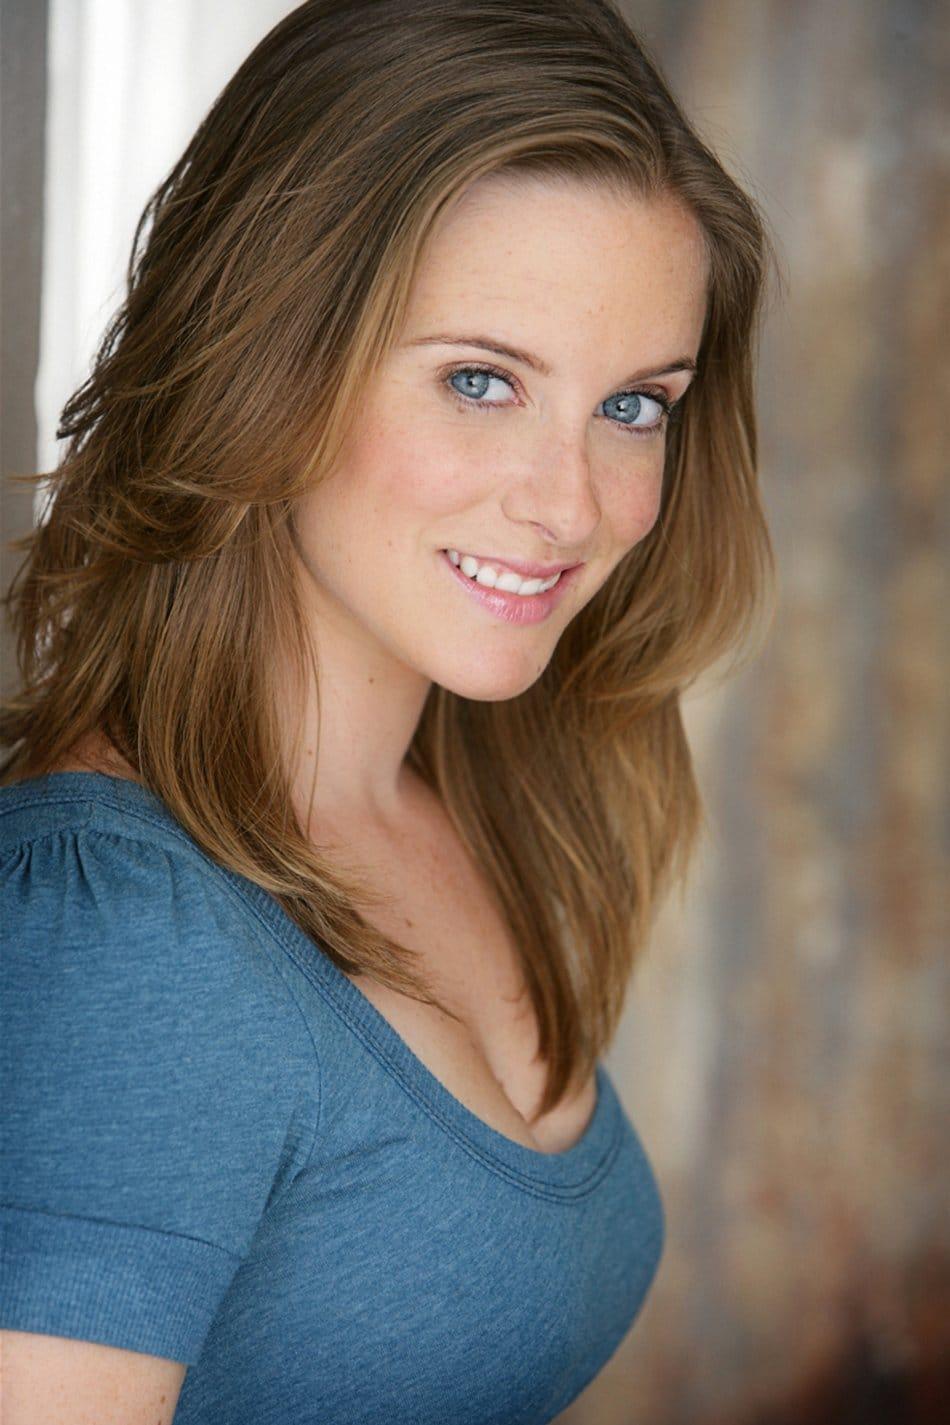 Marley McClean